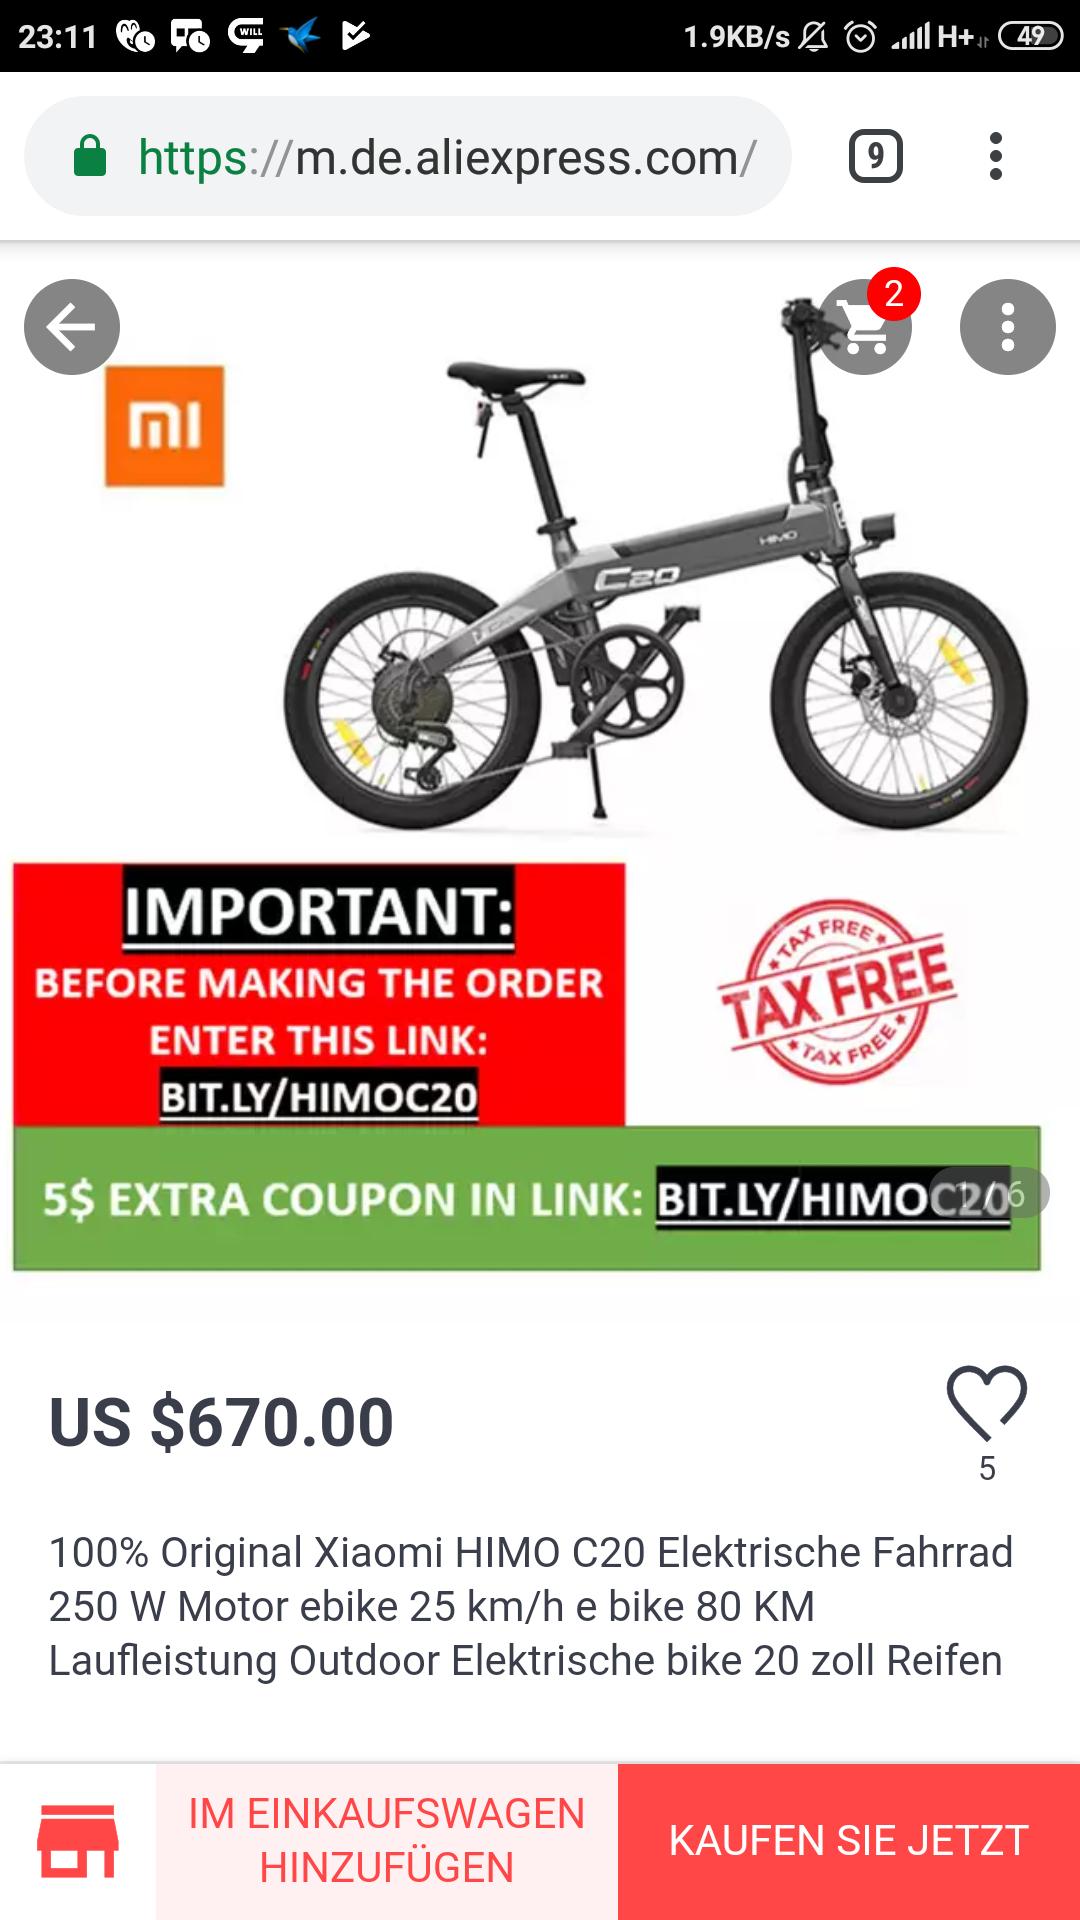 HIMO C20 Xiaomi Qicycle Fahrrad E-Bike